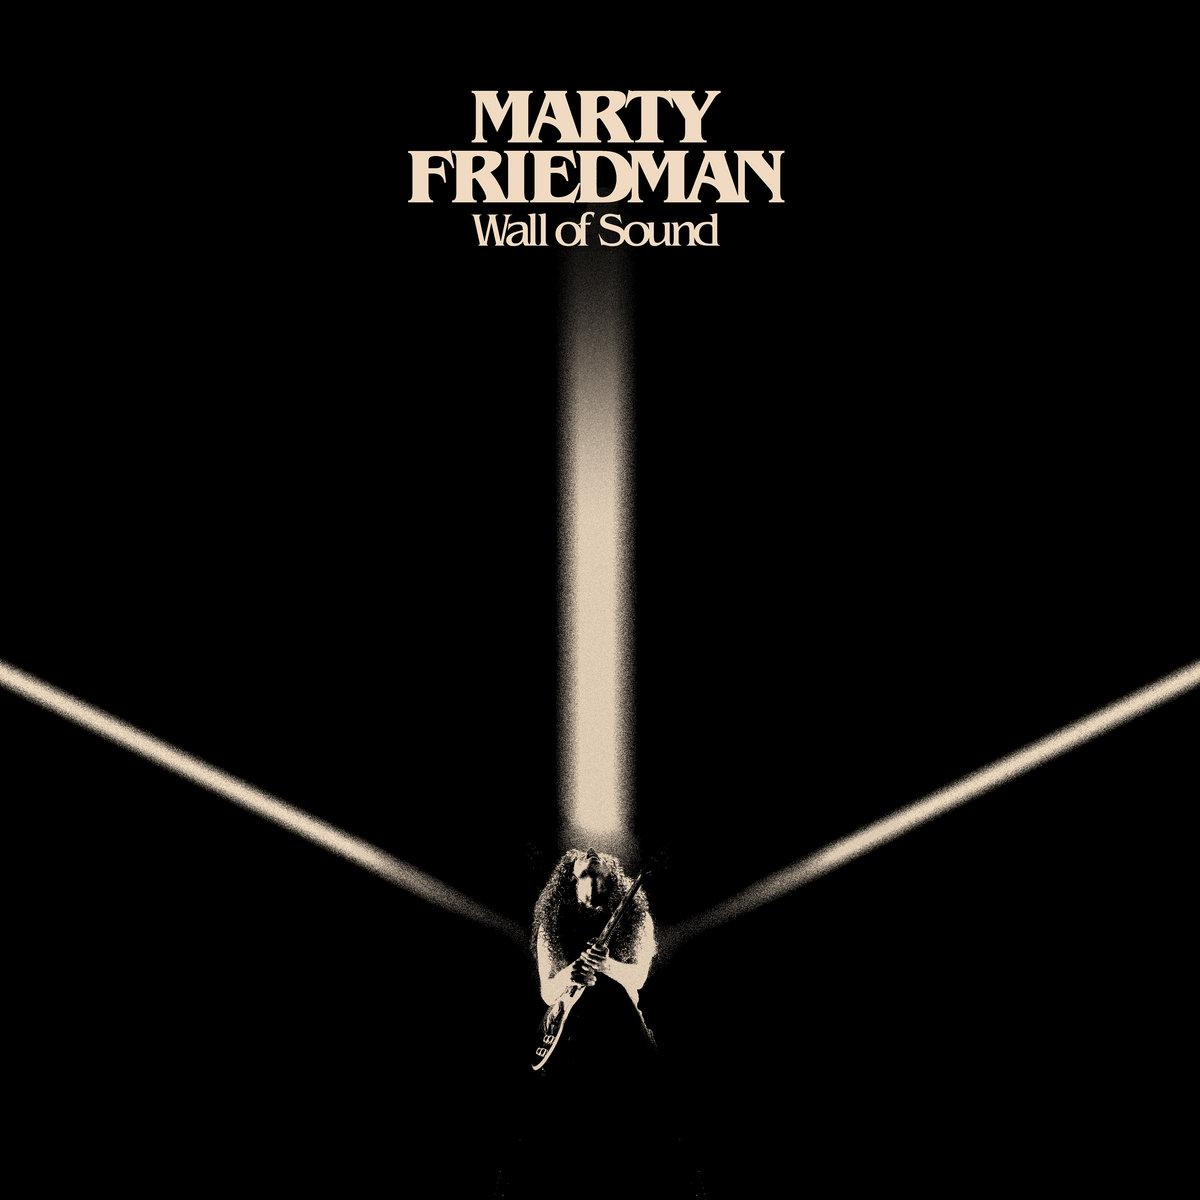 marty friedman torrent